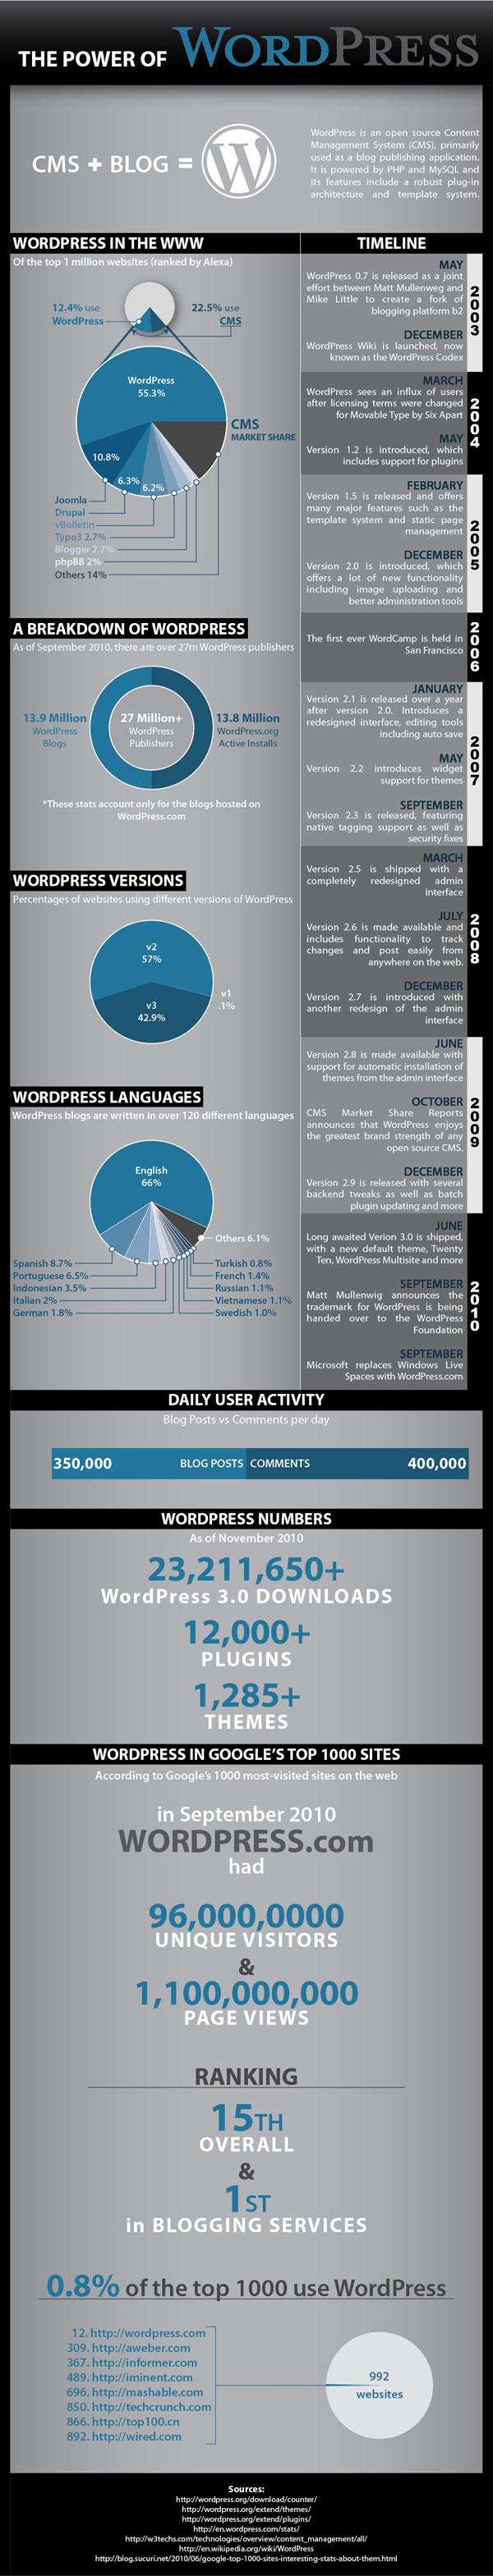 POWordpress v4 600 jonno rodd The Power of WordPress [Infographic]